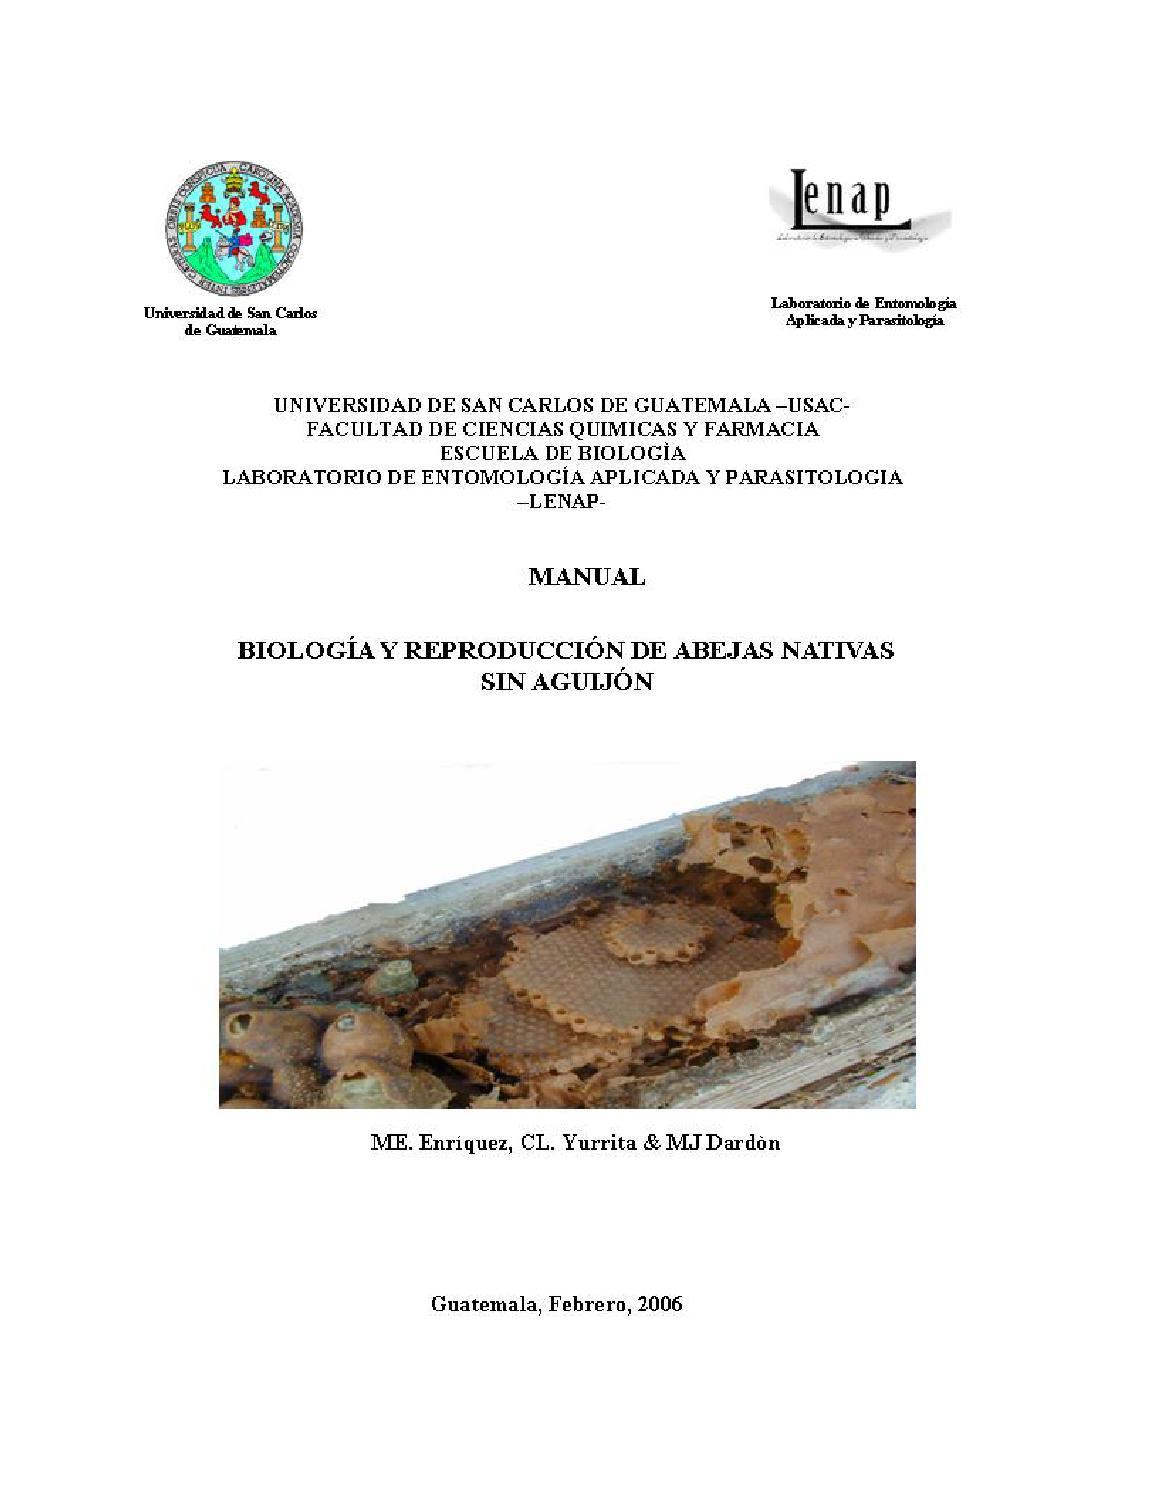 Manual de meliponicultura by Marco Acuña - issuu